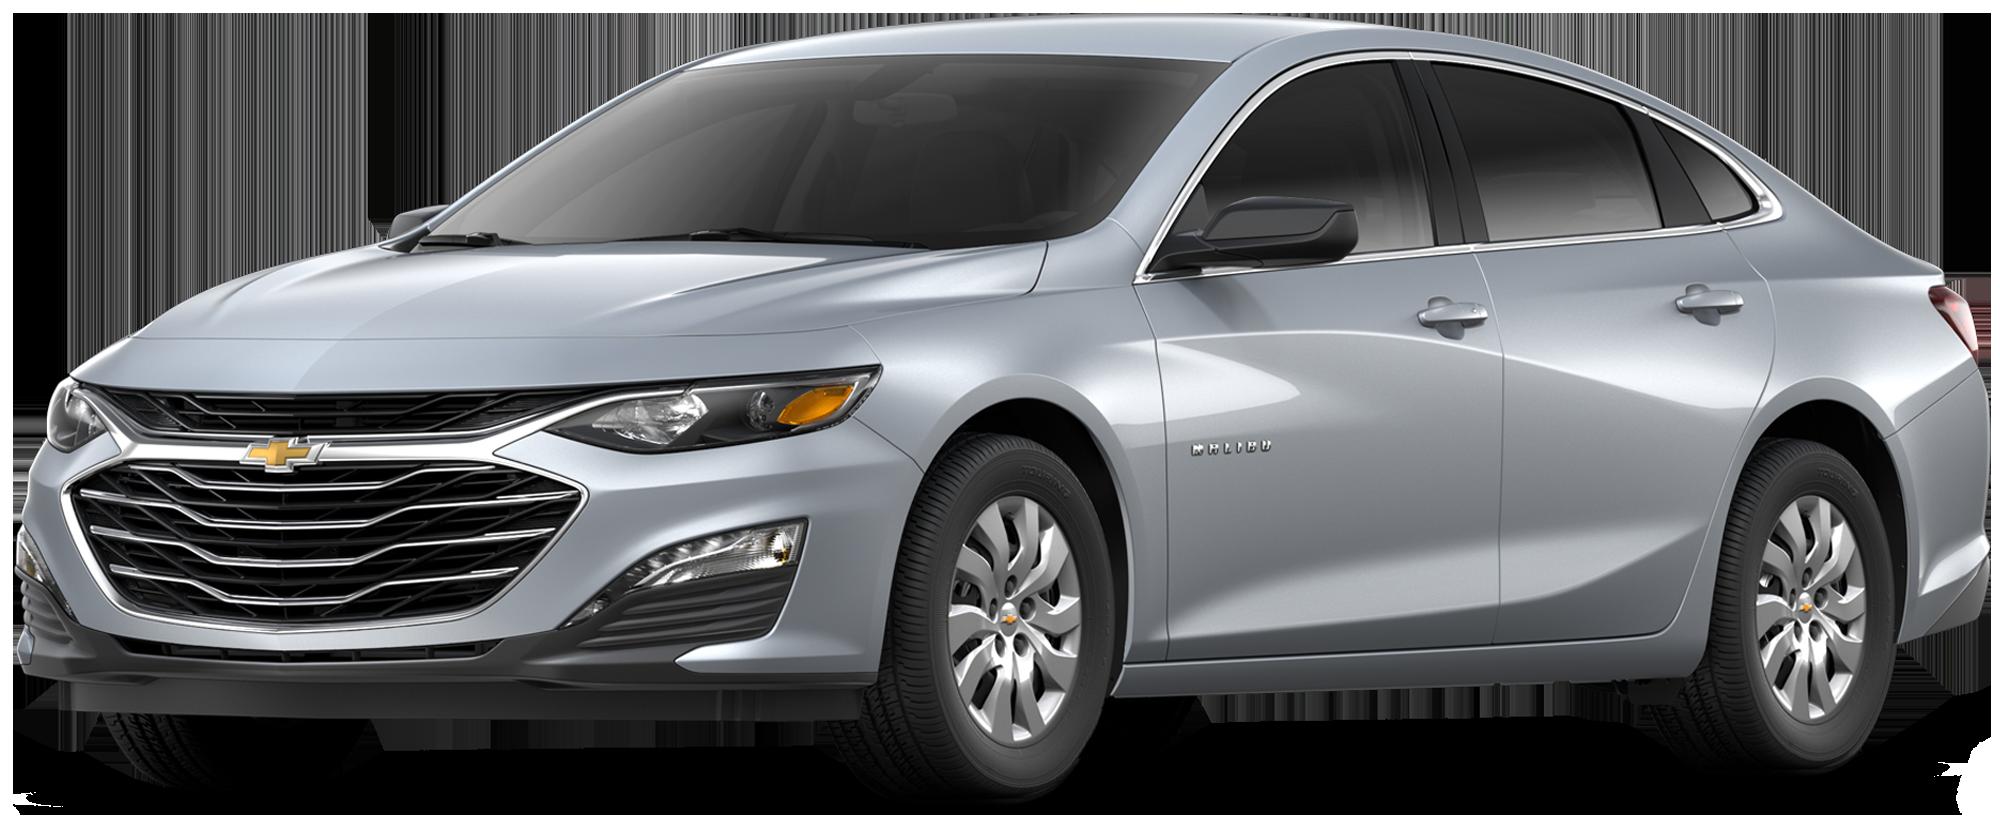 Chevrolet Model Research In Clintonville Wi Klein Auto